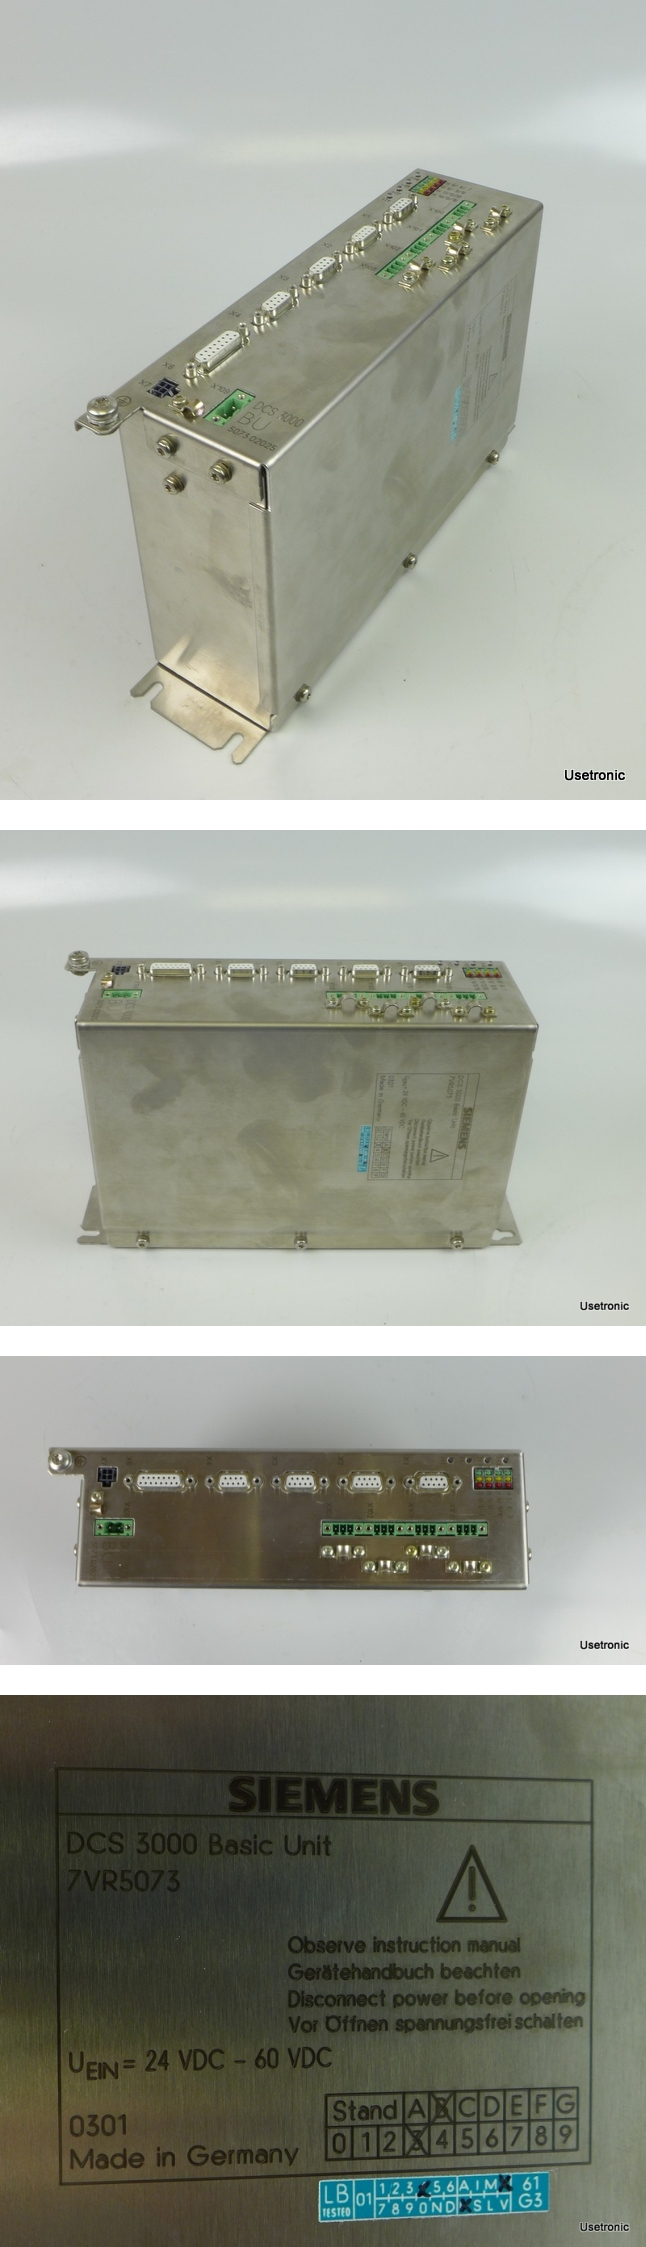 Siemens DCS 3000